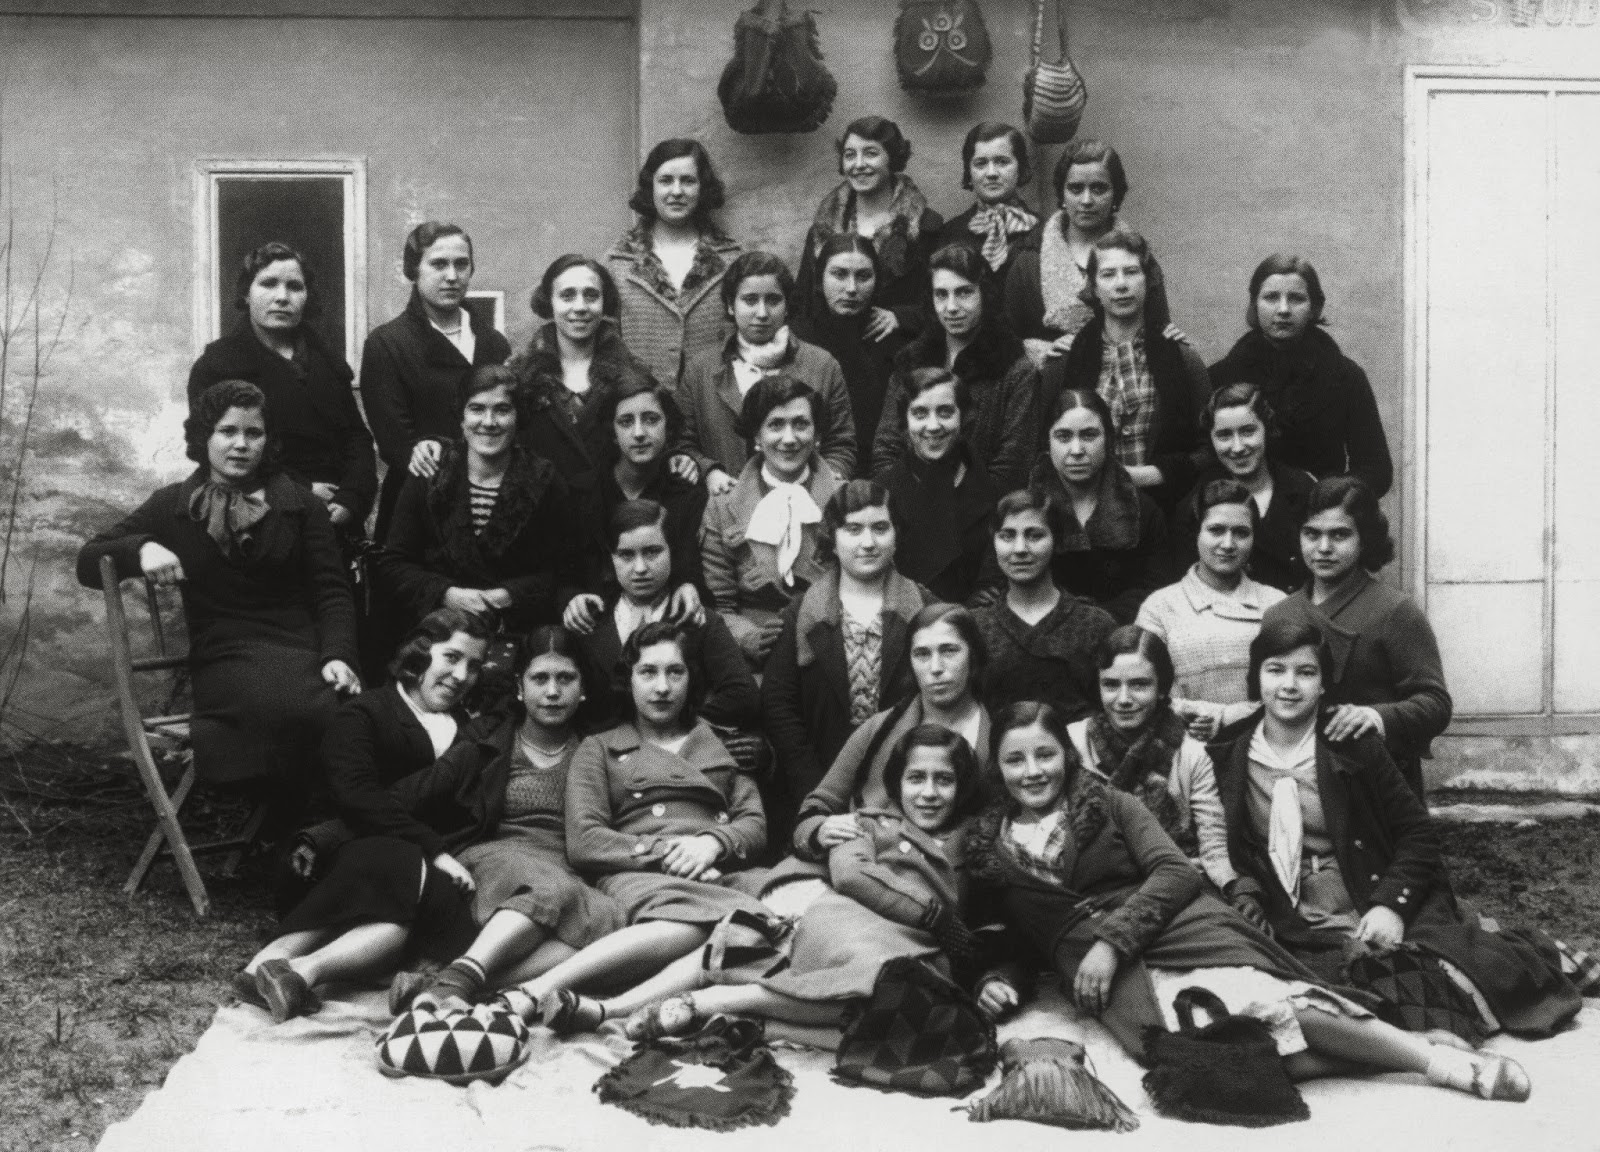 Mujeres solteras manos en alcorcón